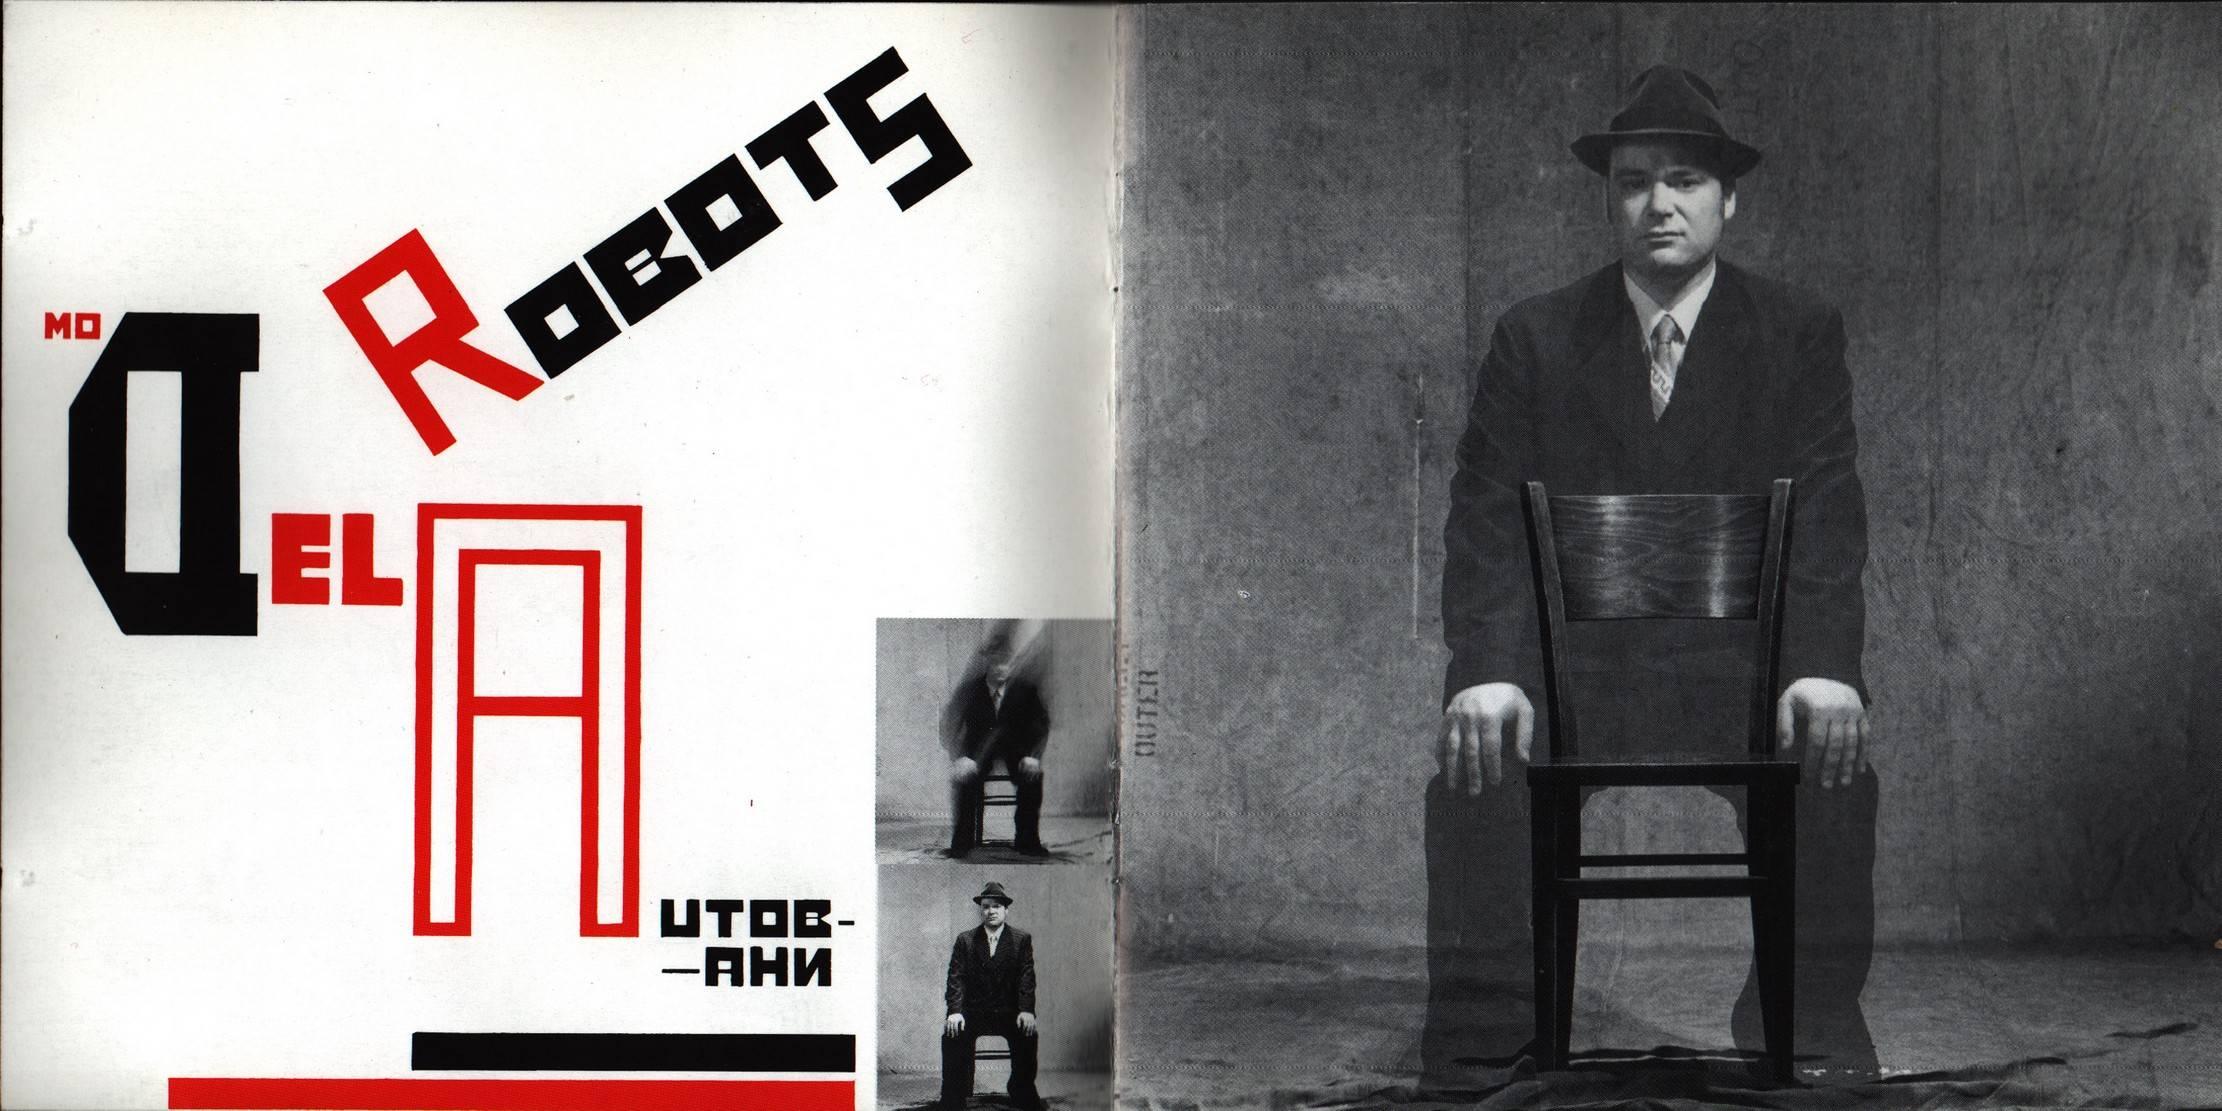 Balanescu quartet possessed rapidshare